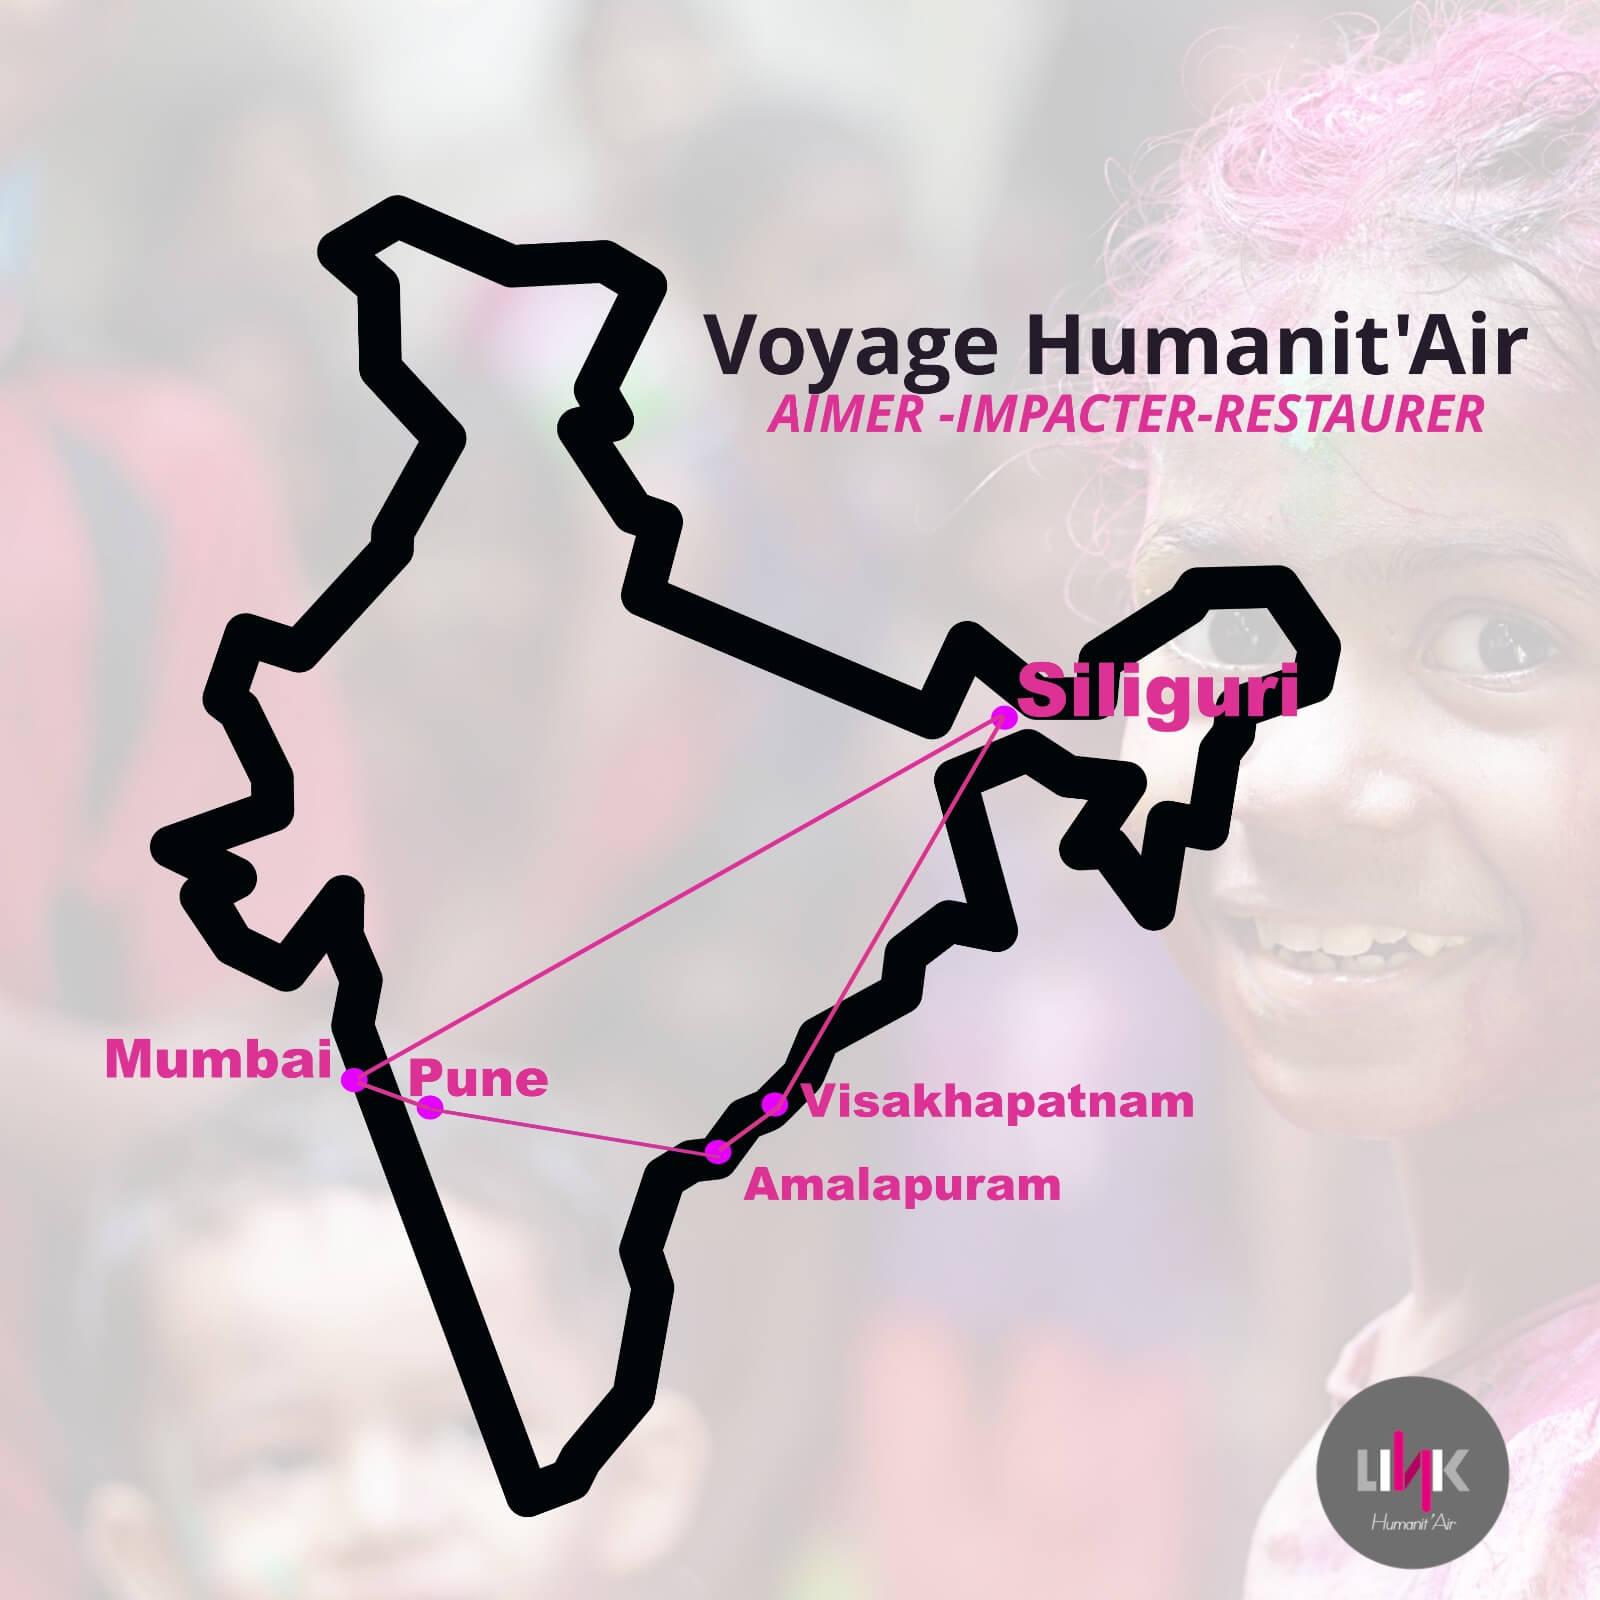 Voyage humanitaire